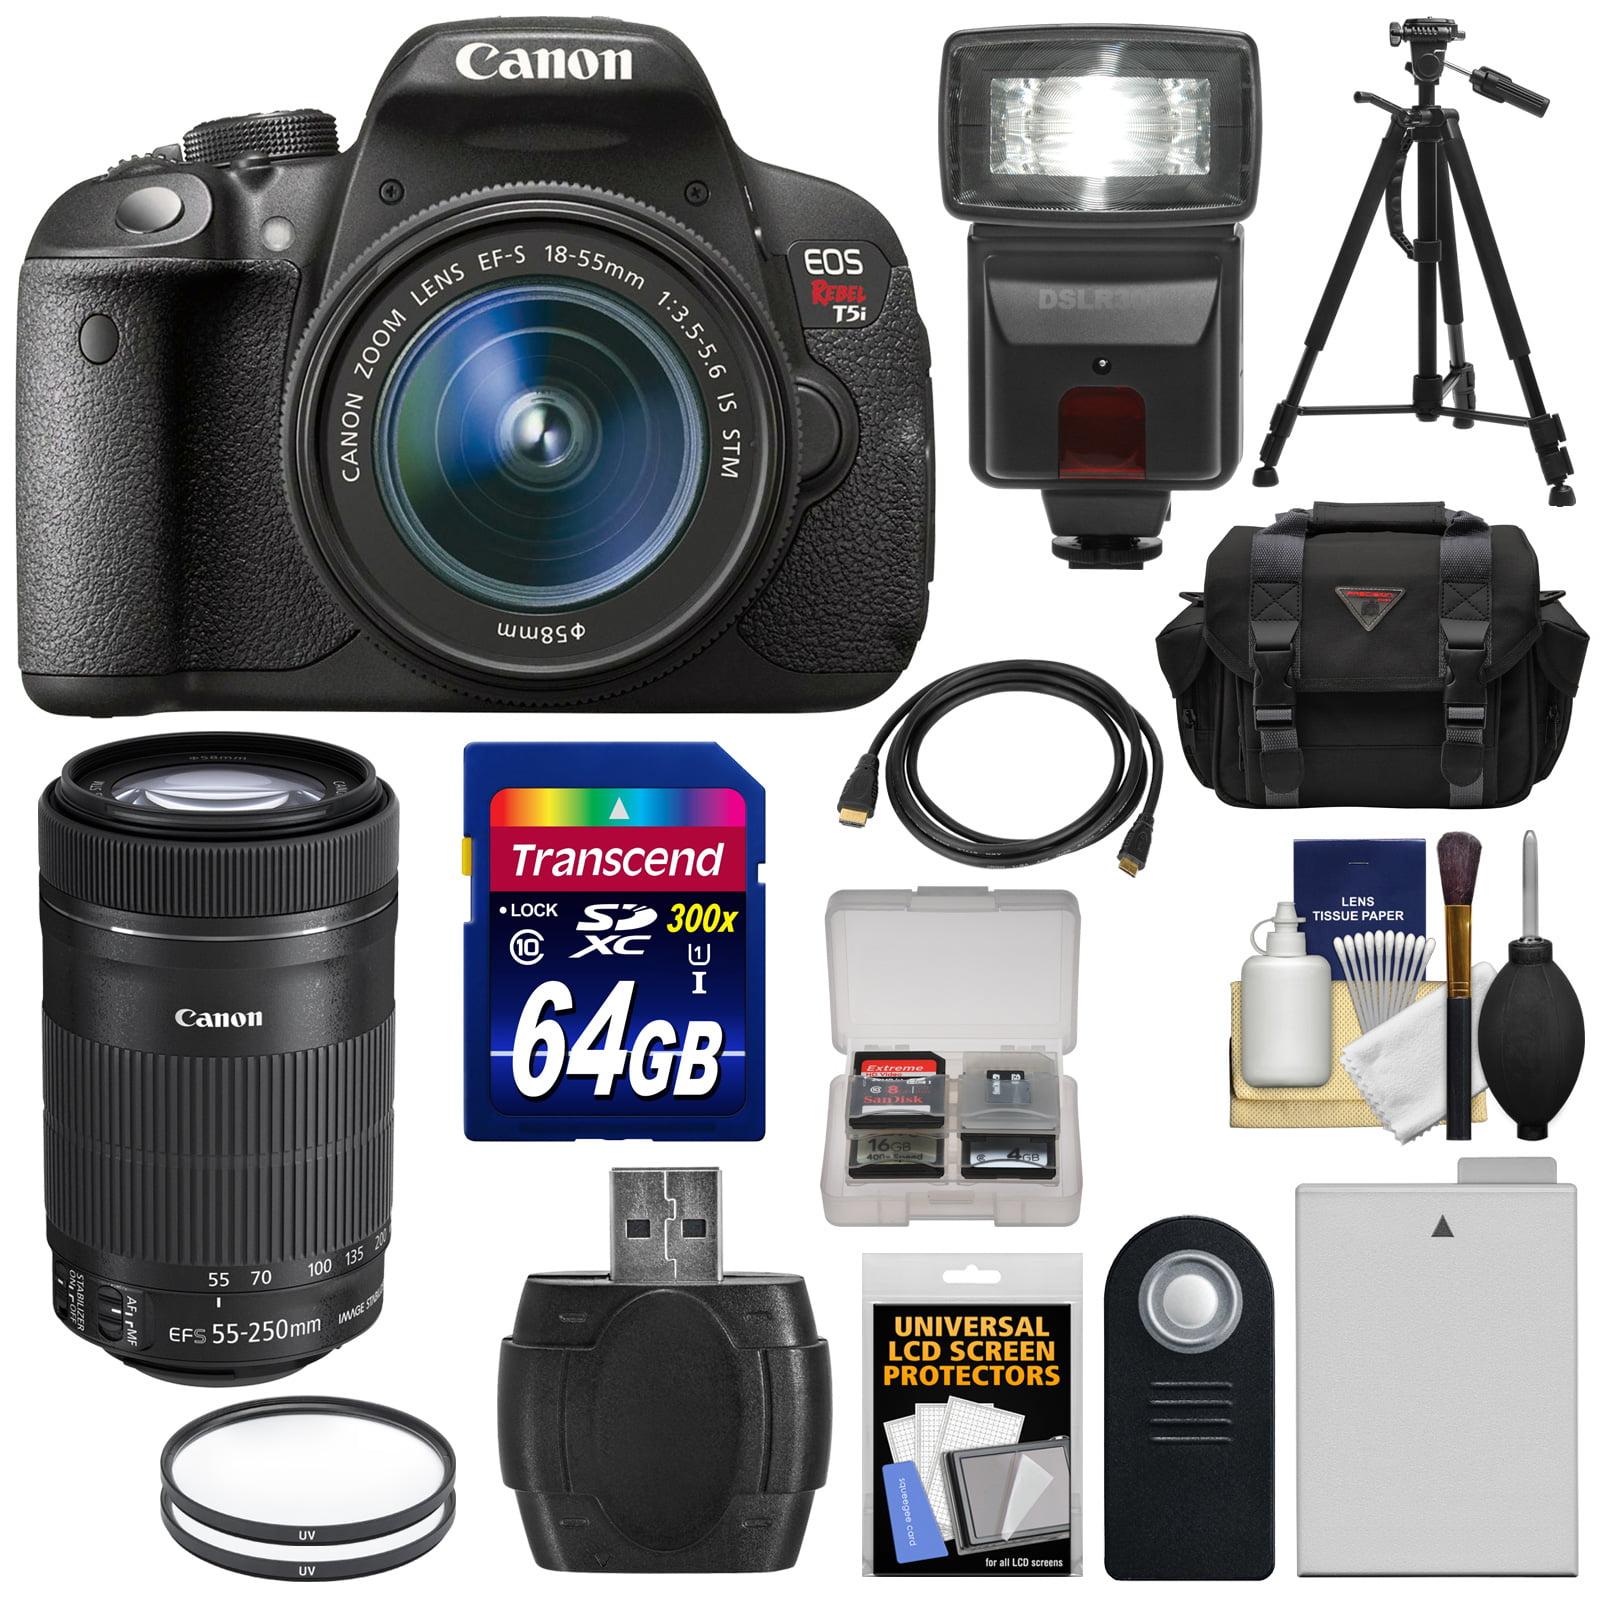 Canon EOS Rebel T5i Digital SLR Camera & 18-55mm IS & 55-250